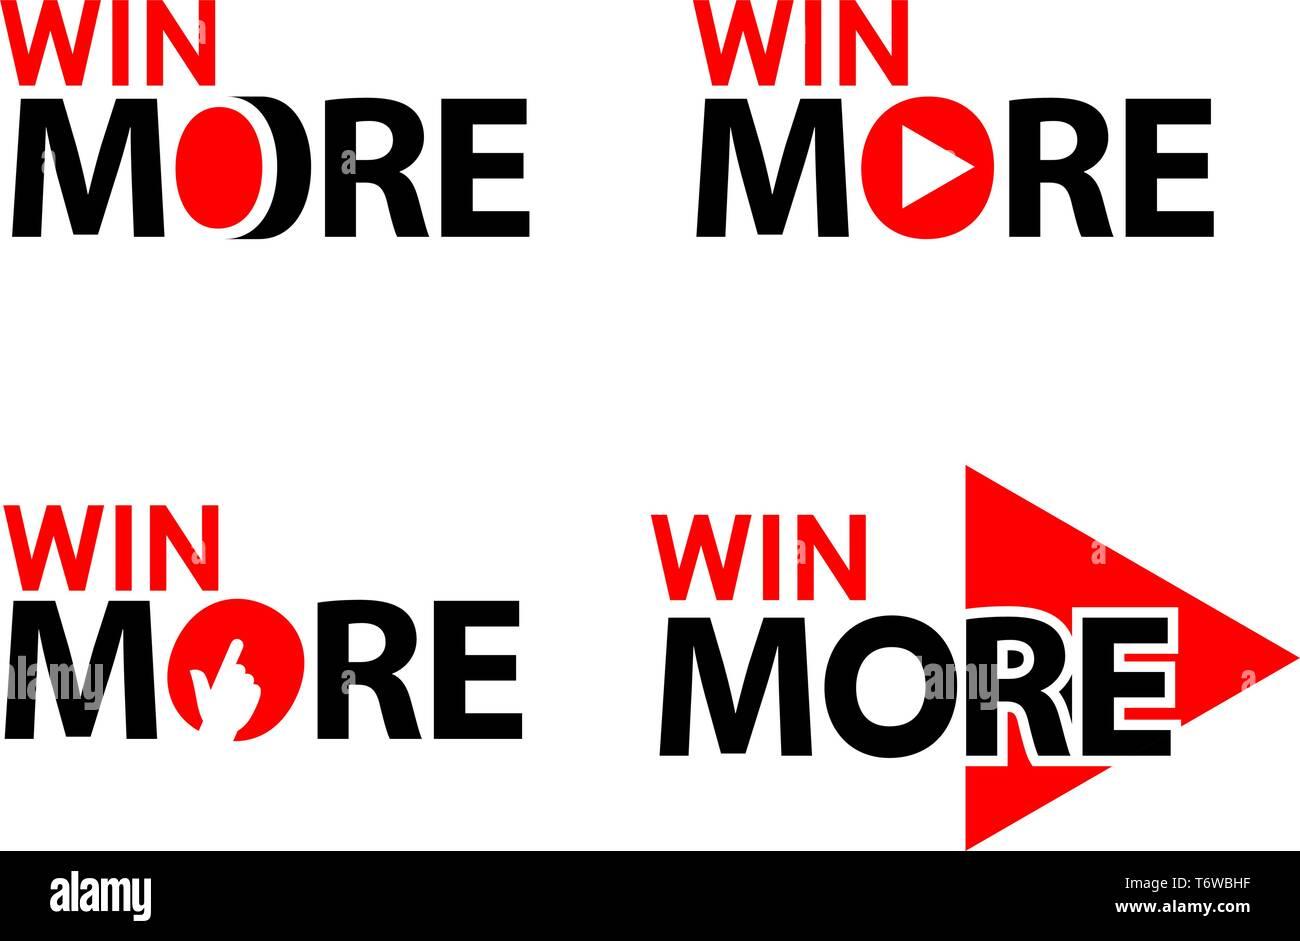 Win more. Creative lettering vector illustration. illustration in vector format. - Stock Vector